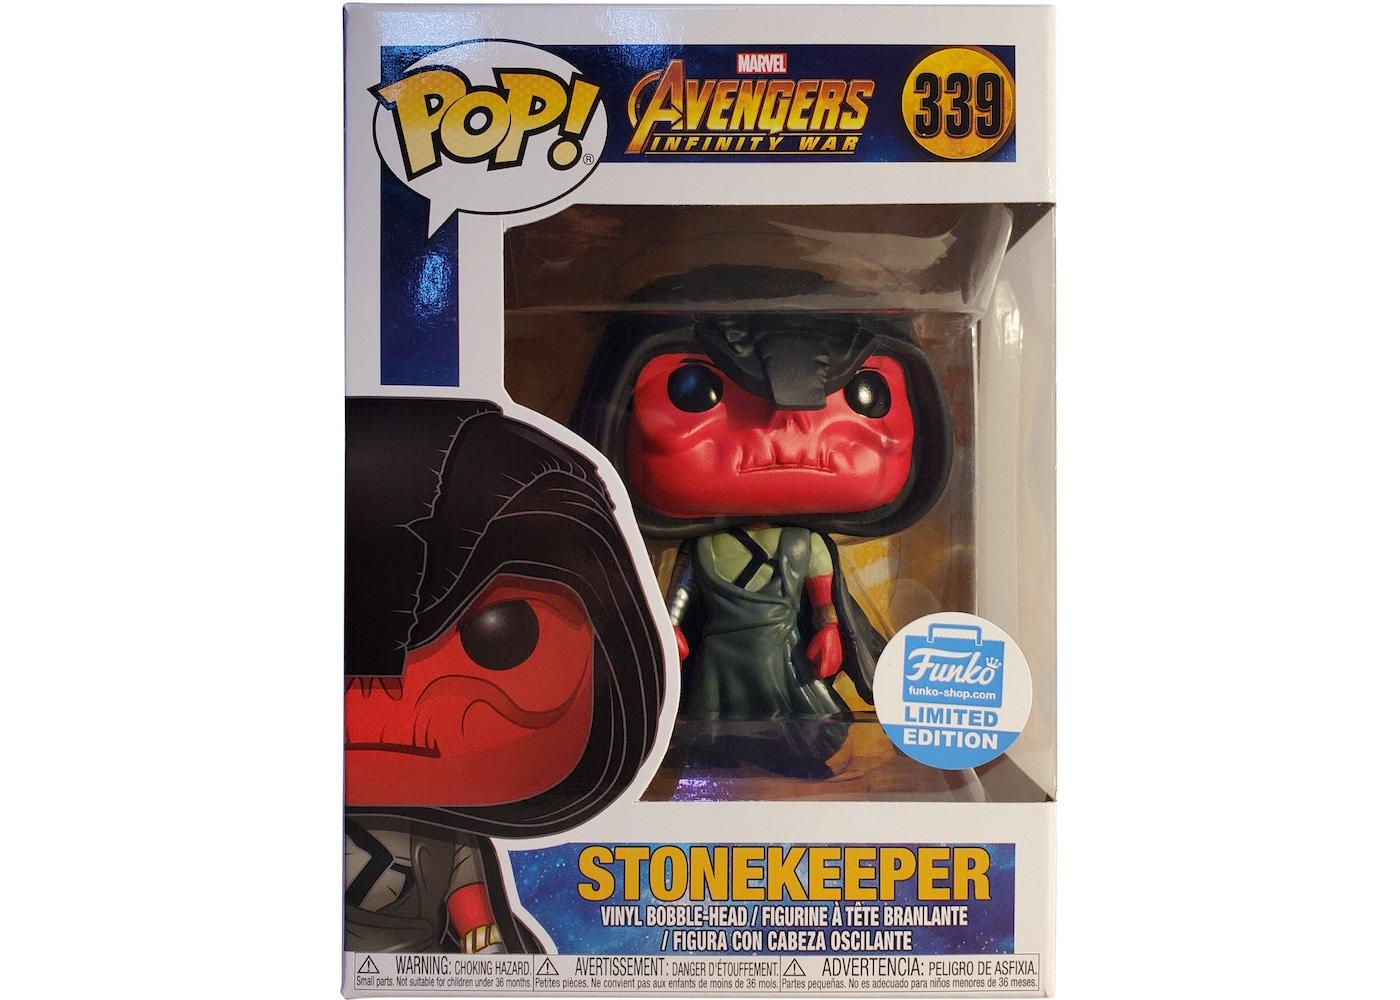 Funko Pop Marvel Avengers Infinity War Stonekeeper Funko Shop Exclusive Figure 339